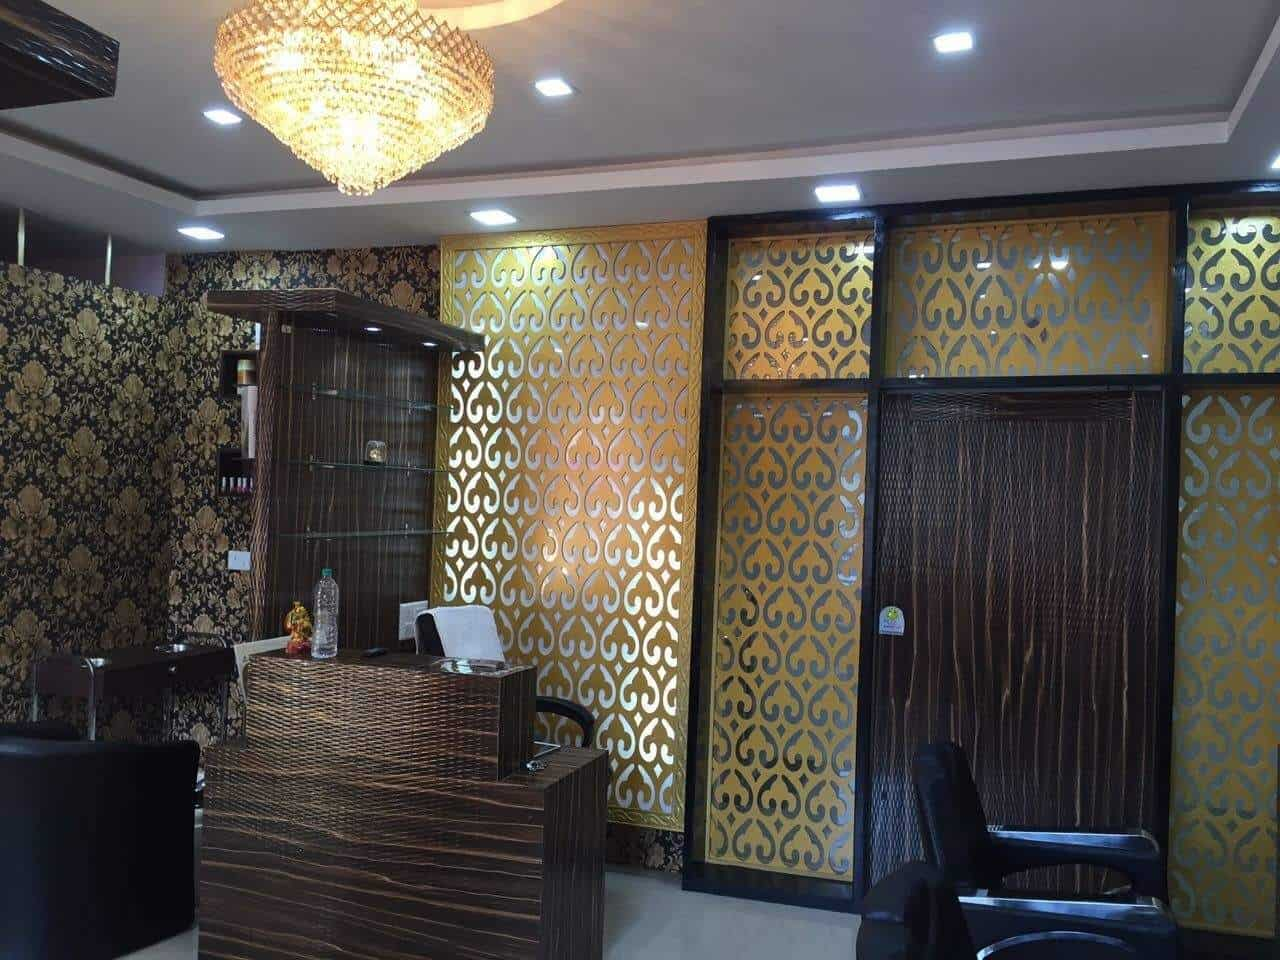 ... Inside View - Pink Door Salon u0026 Spa Photos Nagina Bagh Ajmer - Beauty ... & Pink Door Salon Spa Photos Nagina Bagh Ajmer- Pictures u0026 Images ...